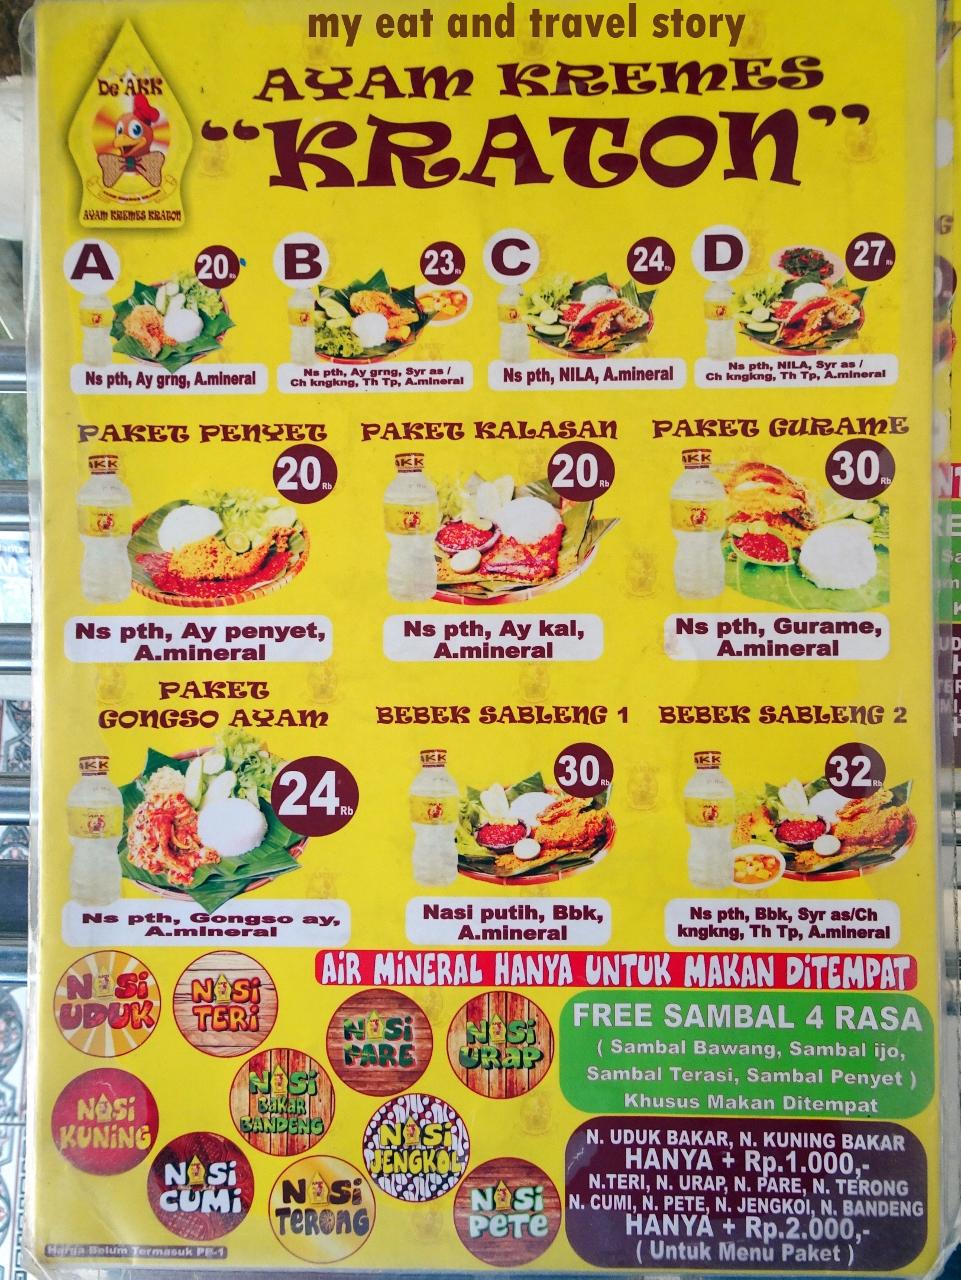 Makan Ayam Kremes Kraton Ditemani Berbagai Pilihan Sambel